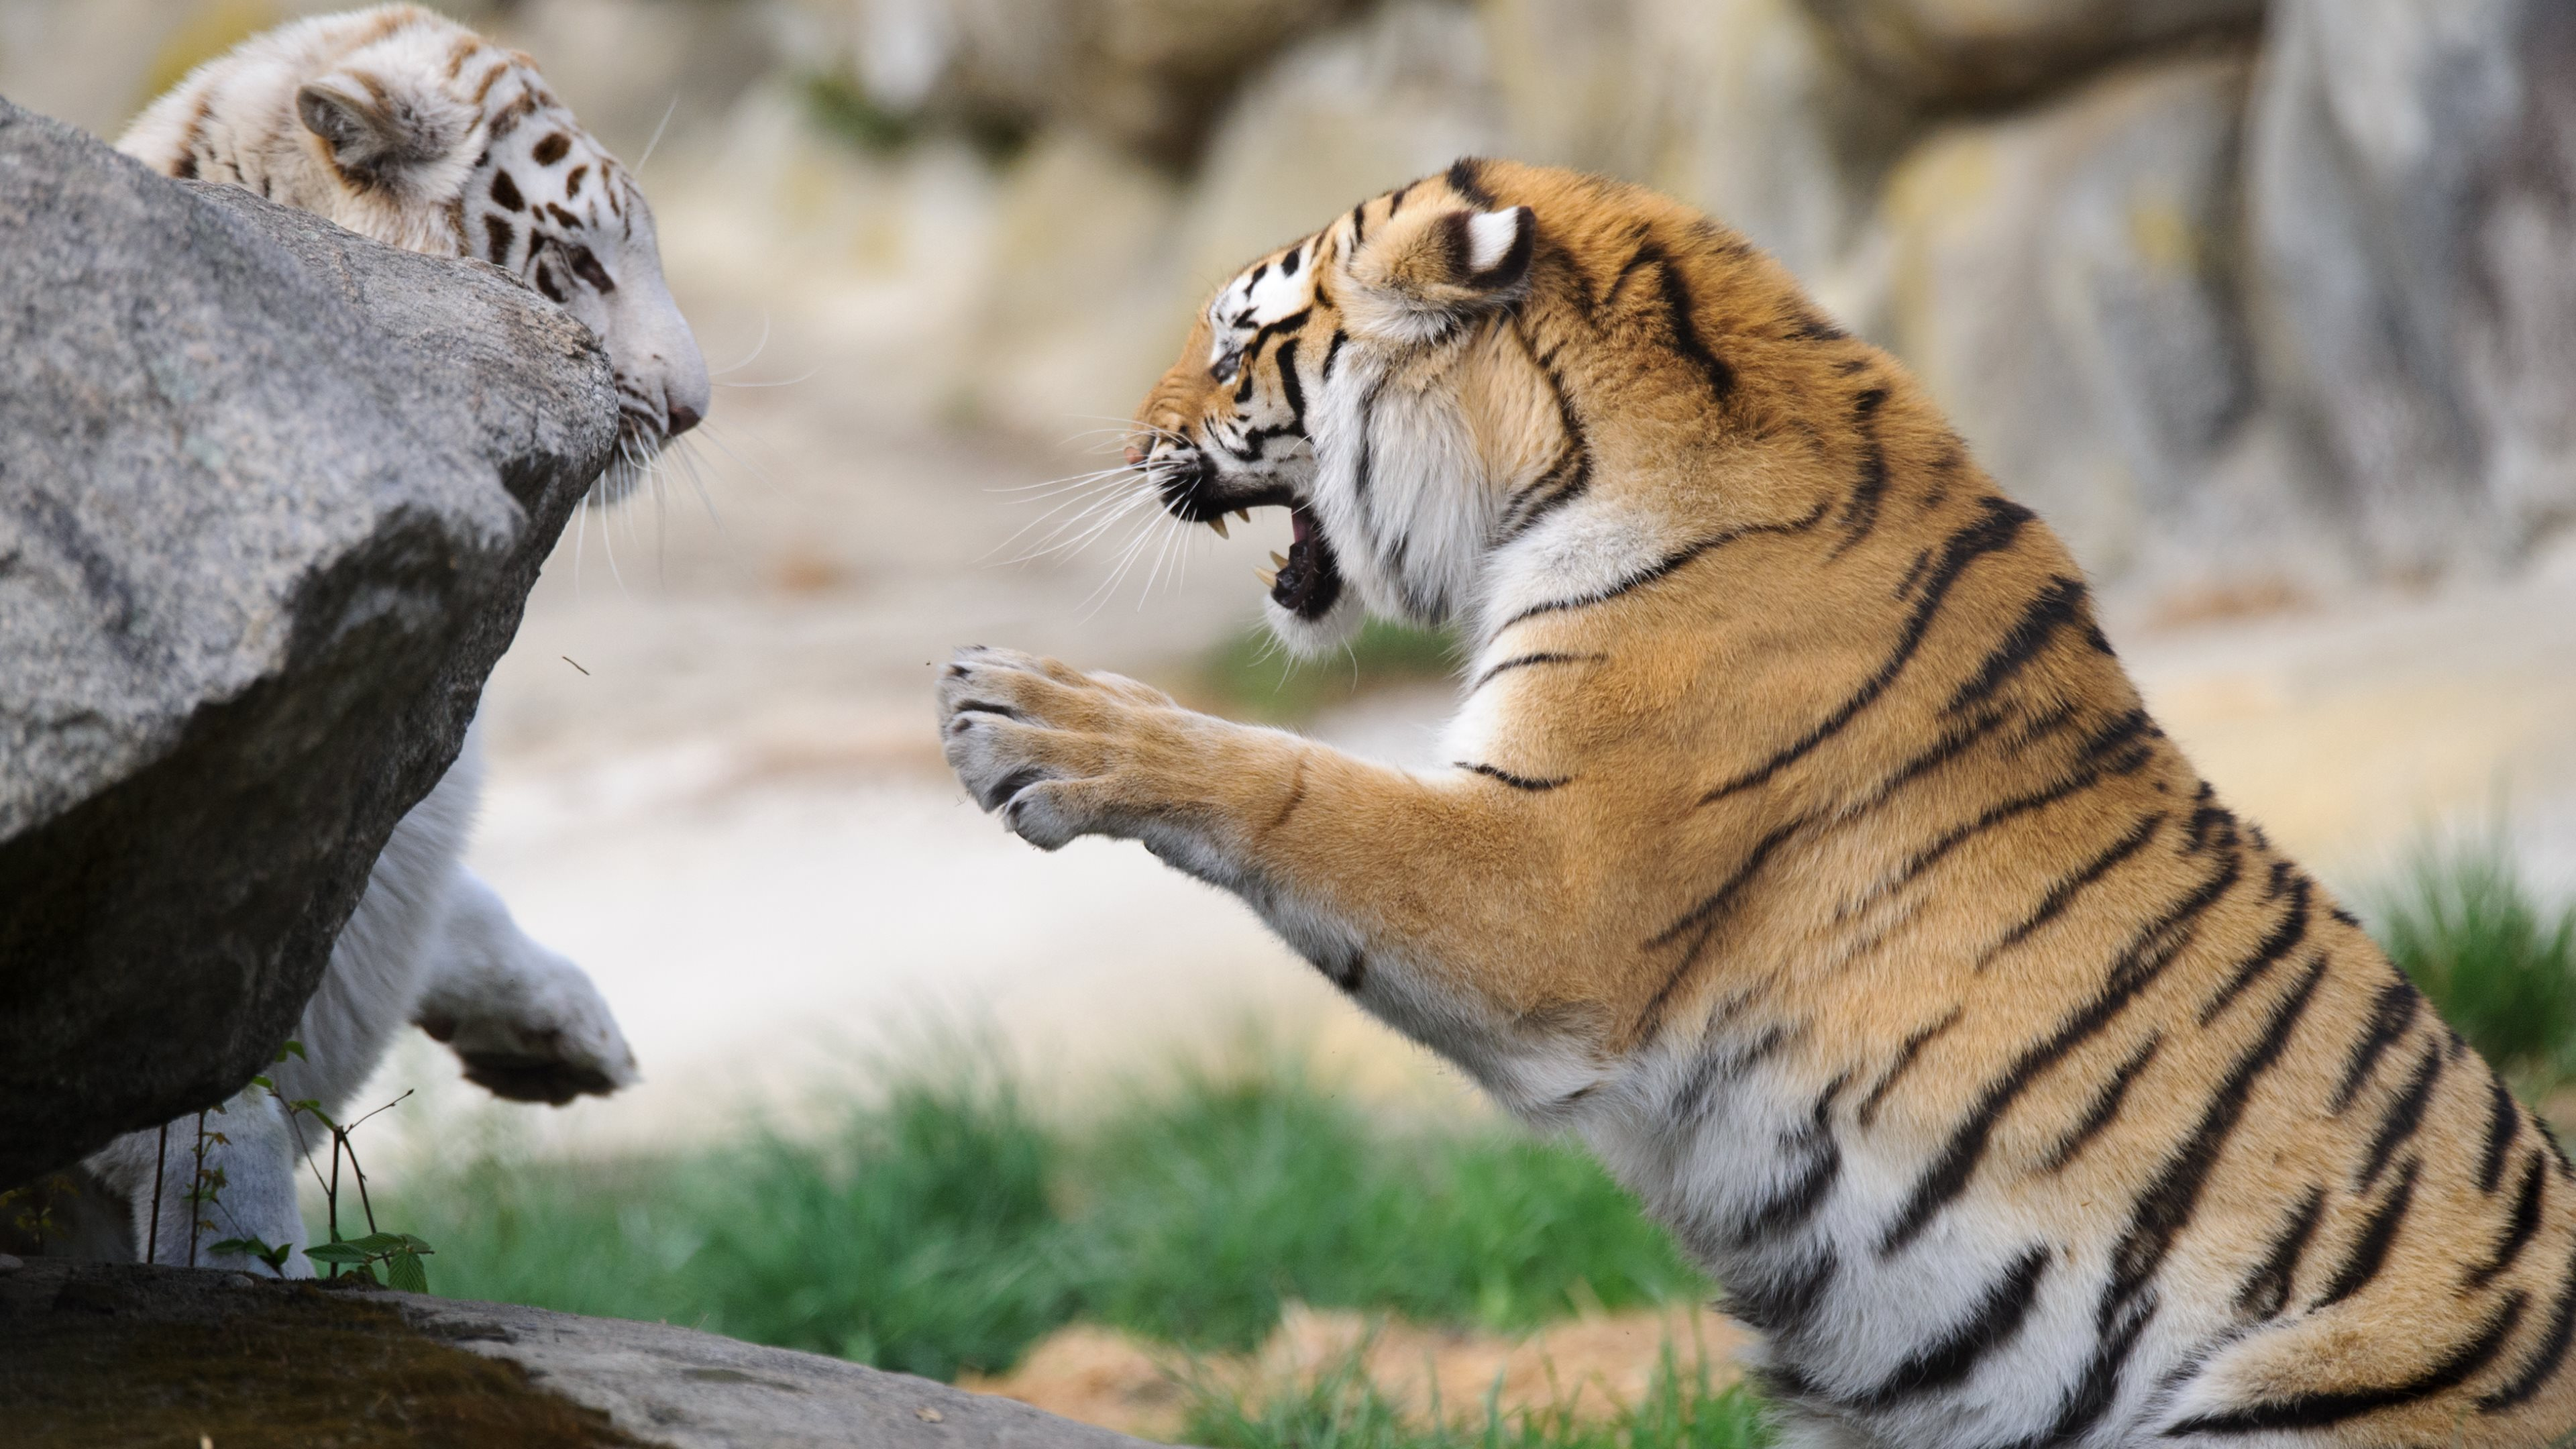 Wild Animal 4k Hd Desktop Wallpaper For 4k Ultra Hd Tv: Tiger 4k Ultra HD Wallpaper